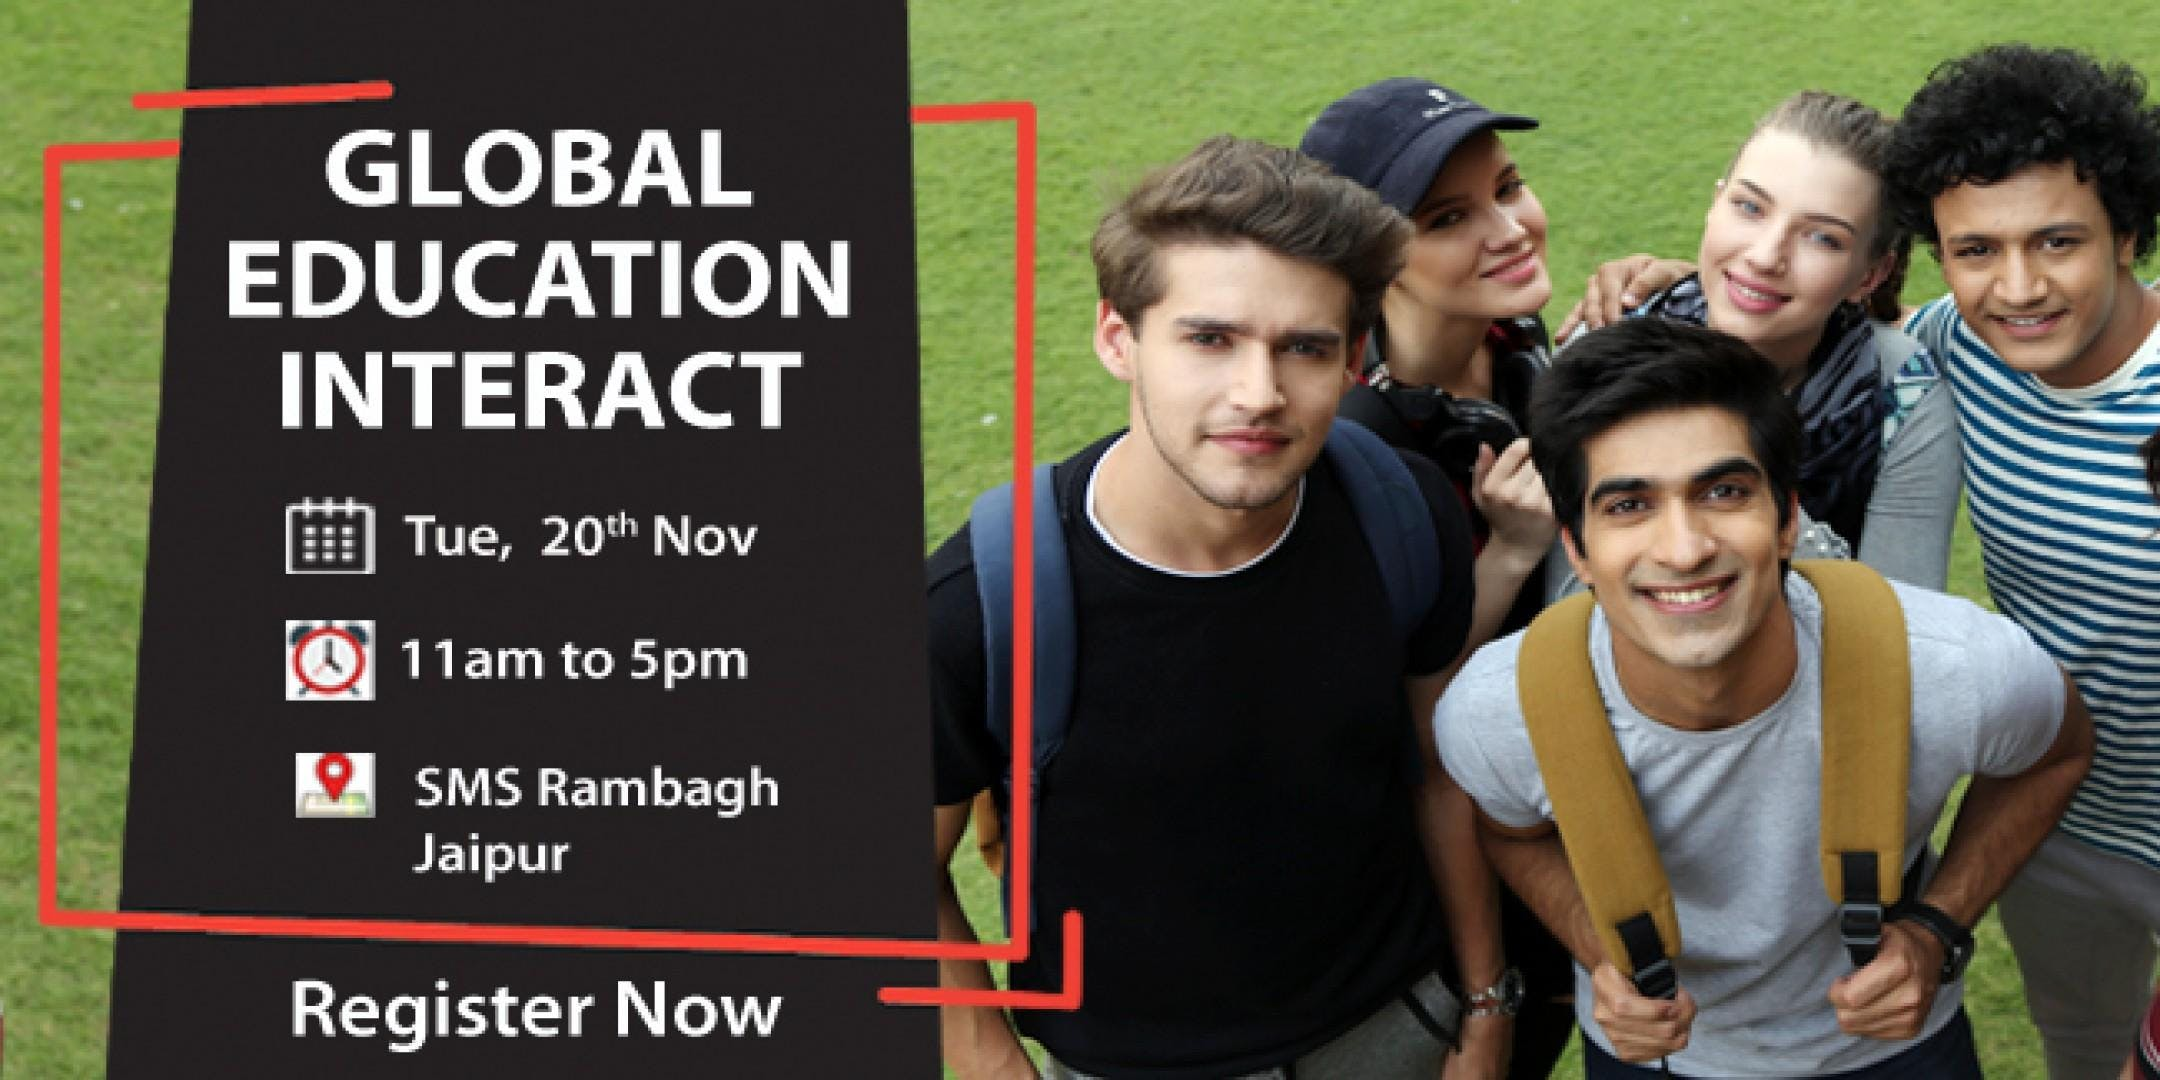 Global Education Fair 2018 in Jaipur - Free R